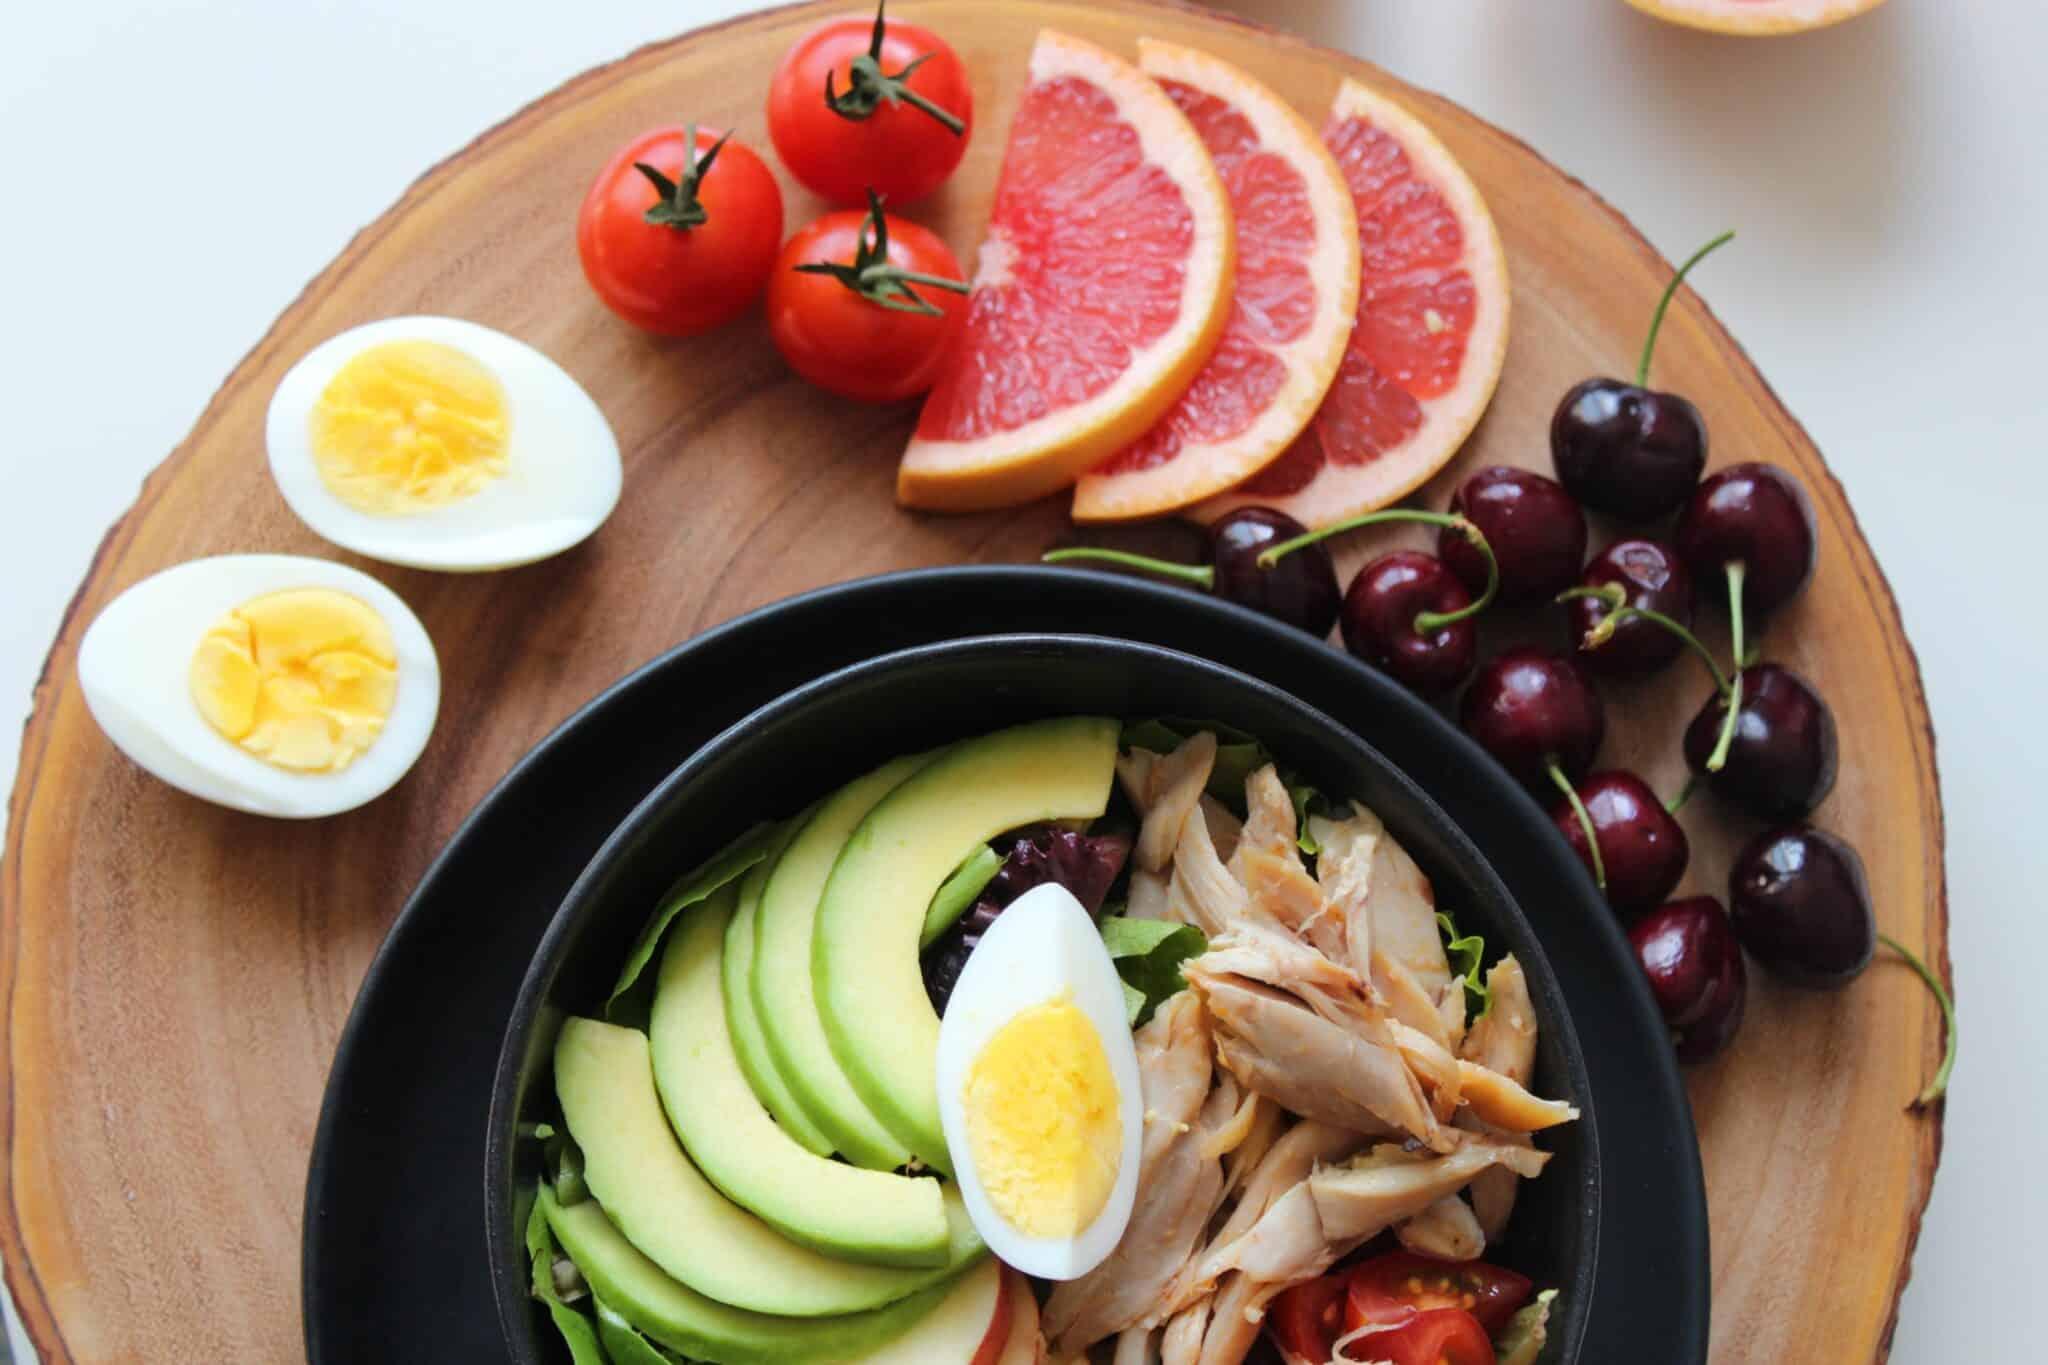 Wooden board of healthy food